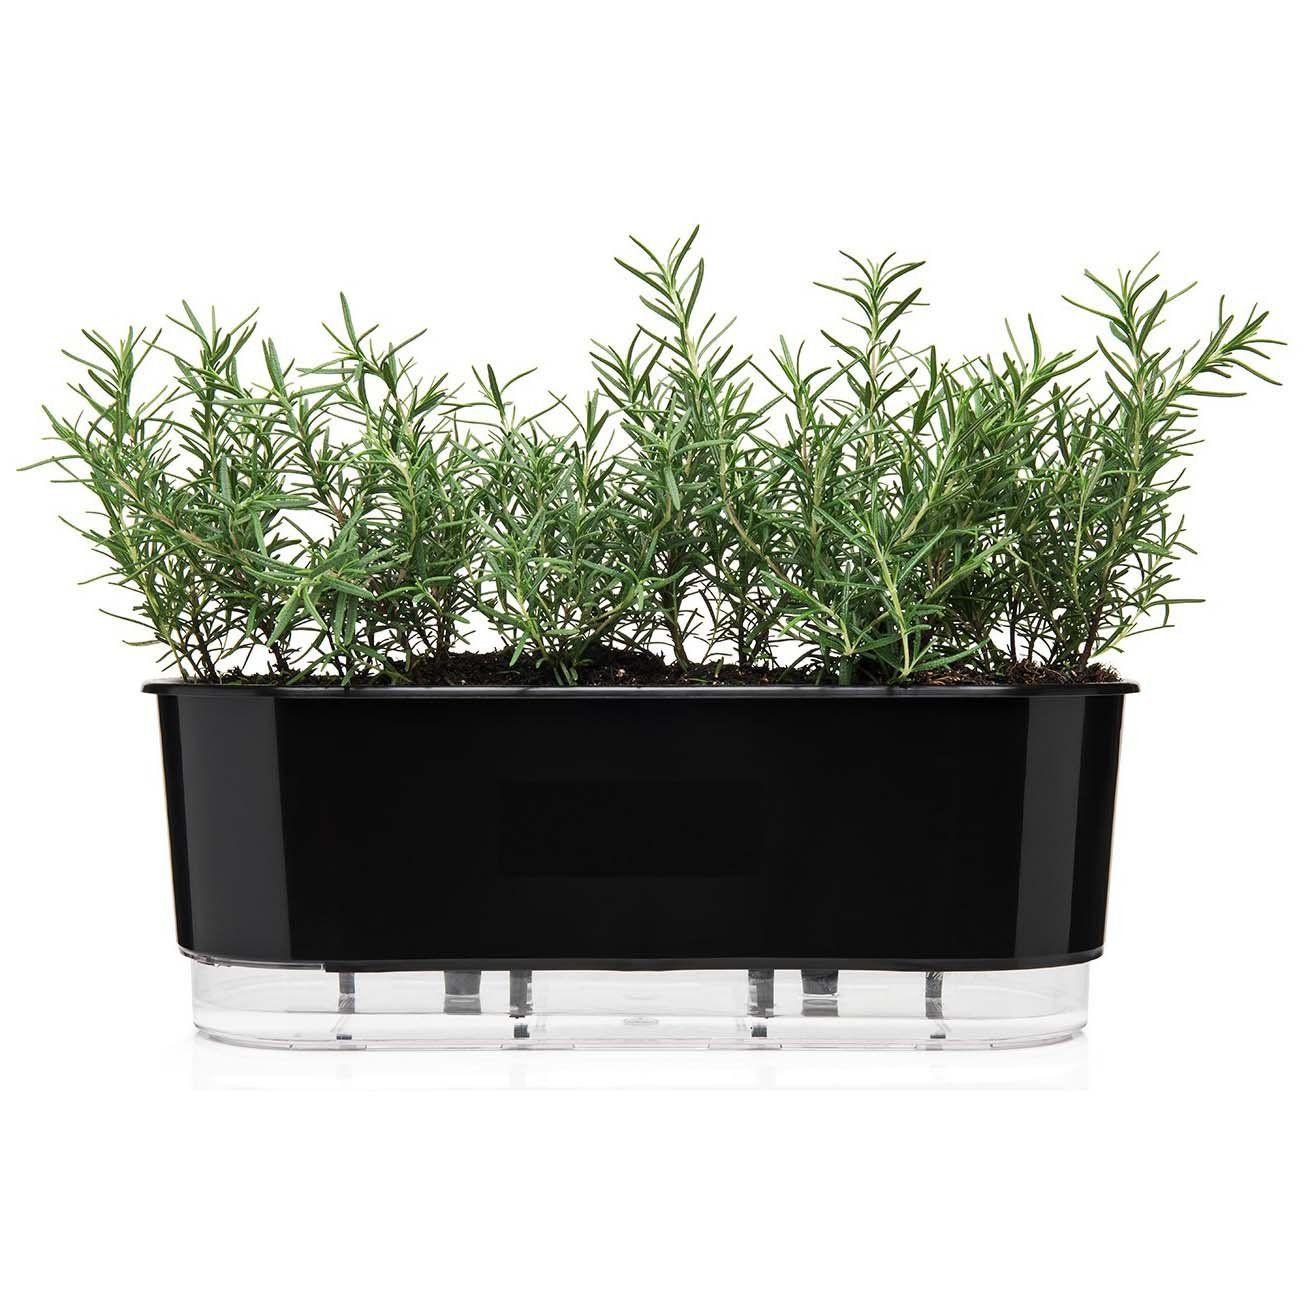 Jardineira Autoirrigável Preto 40cm